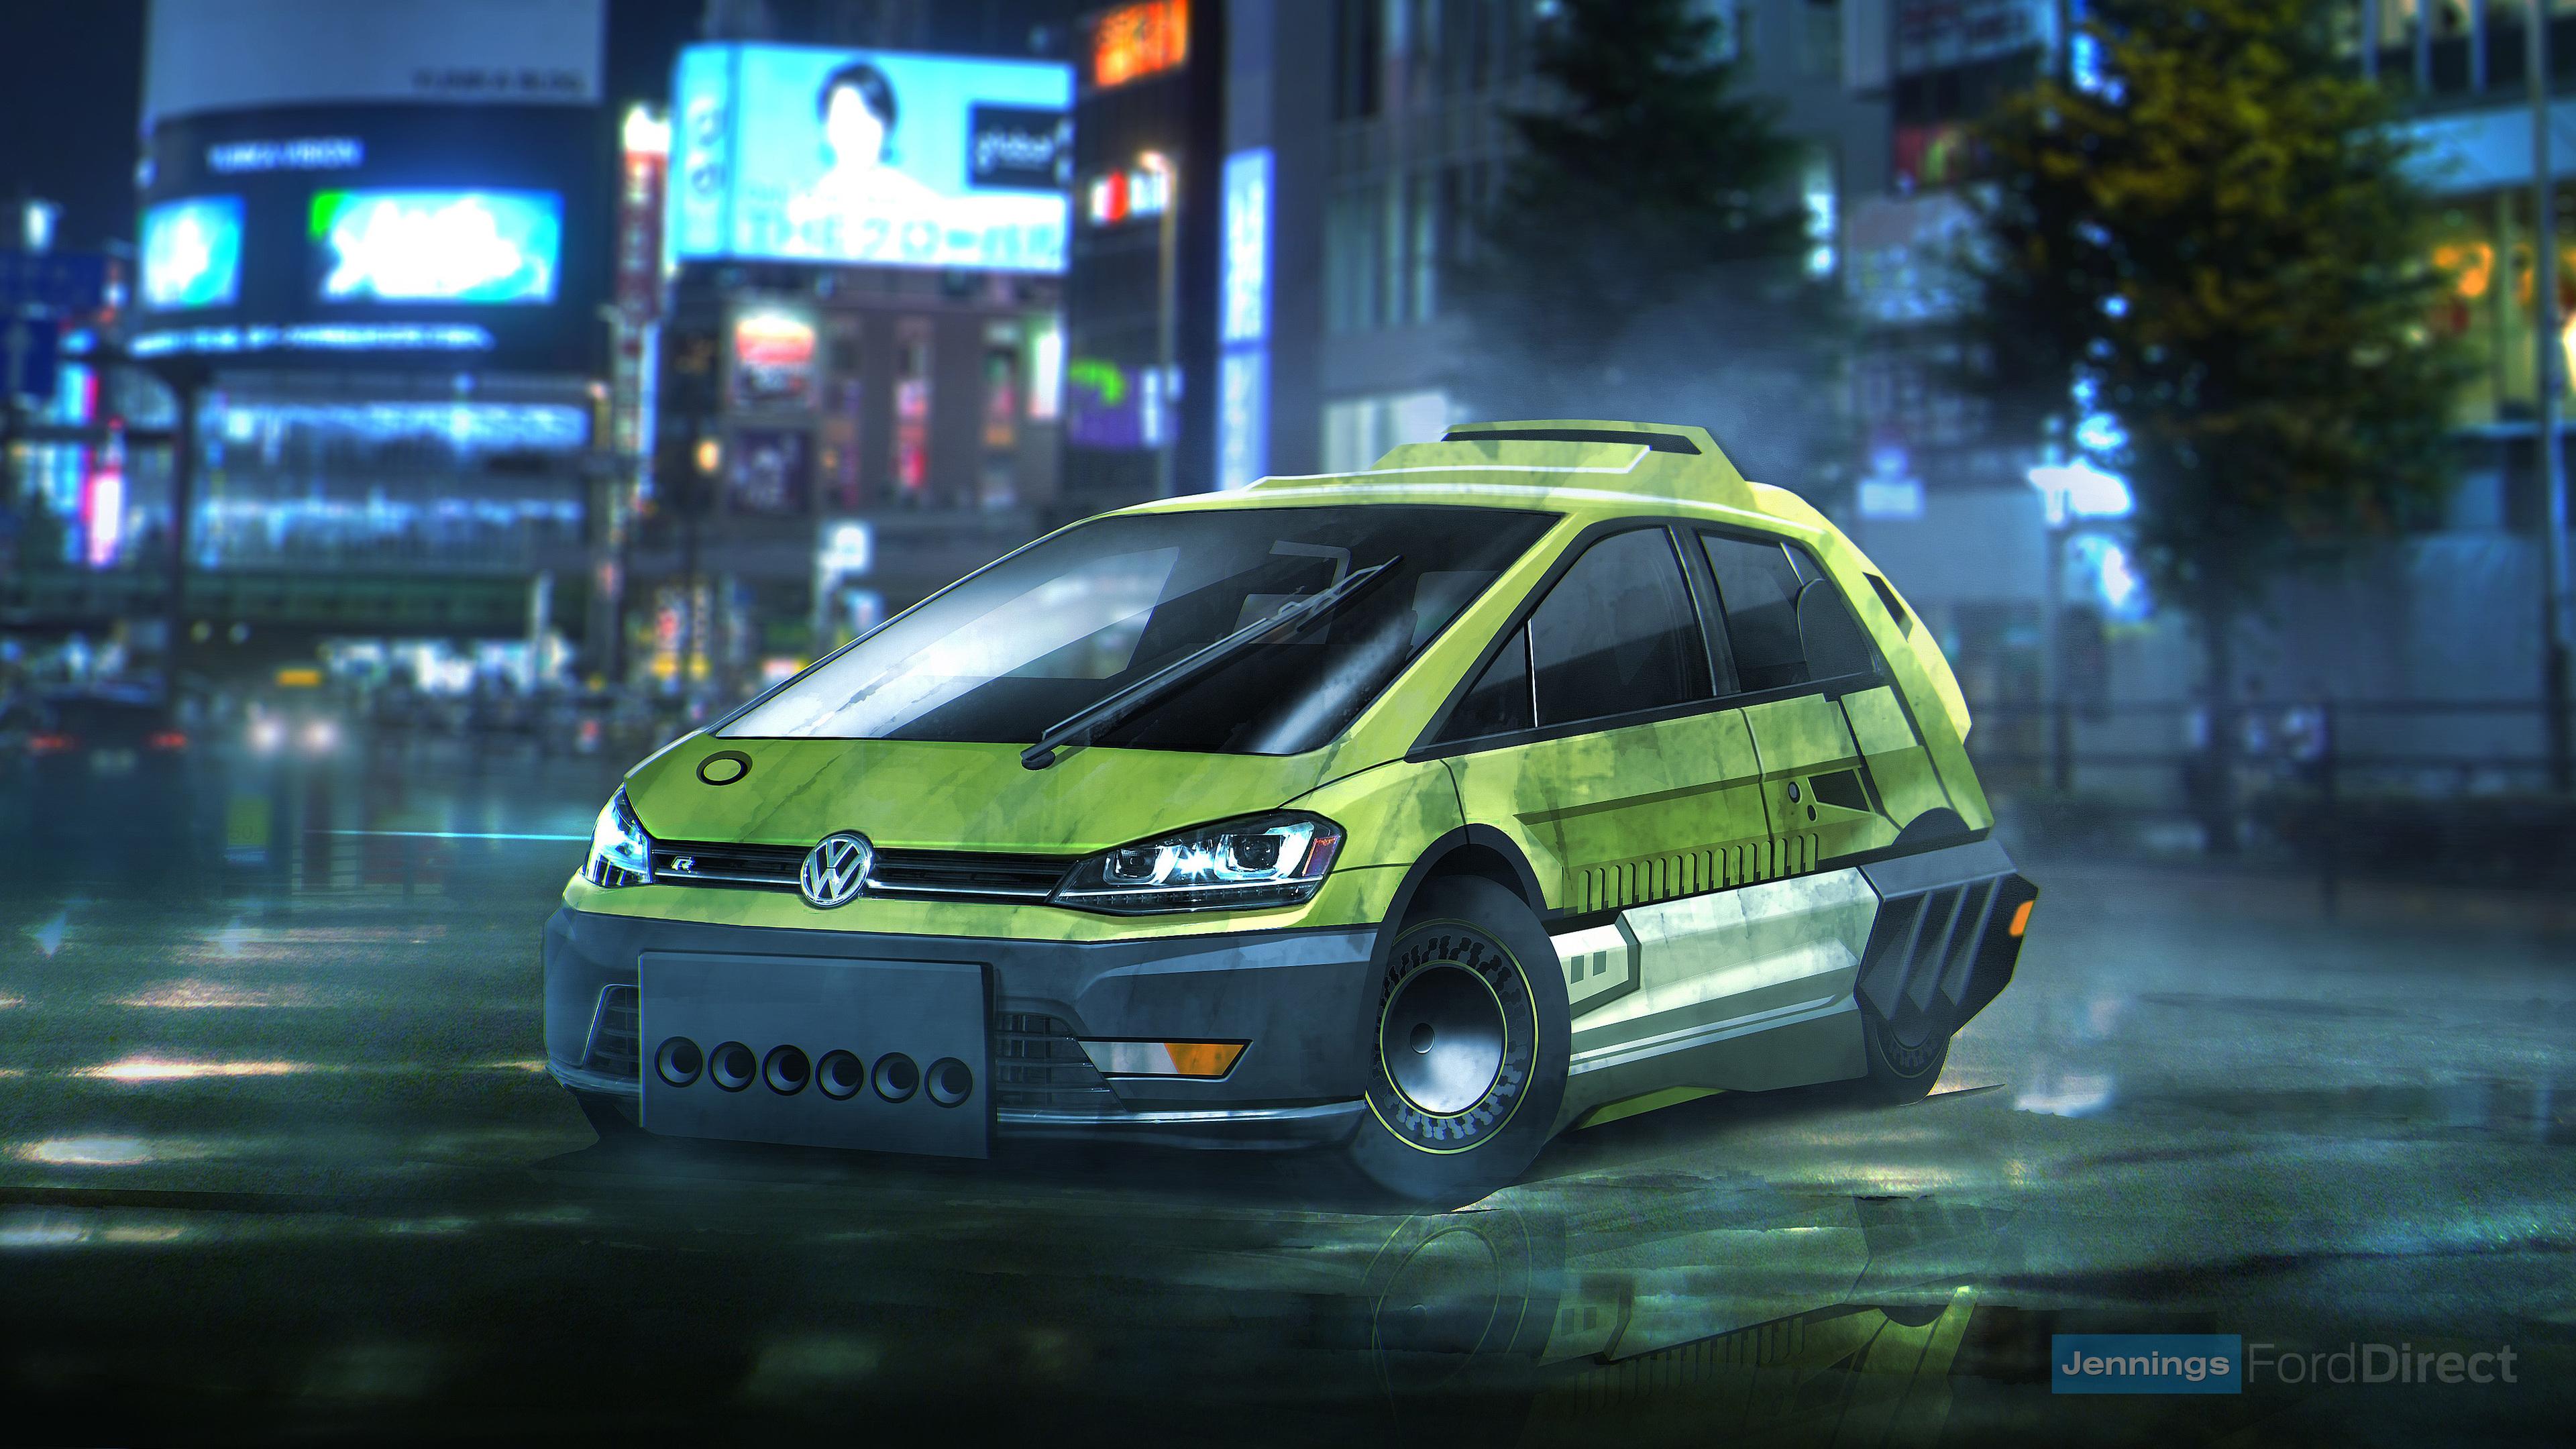 Wallpaper 4k Blade Runner Volkswagen Golf Hatchback 2017 Movies